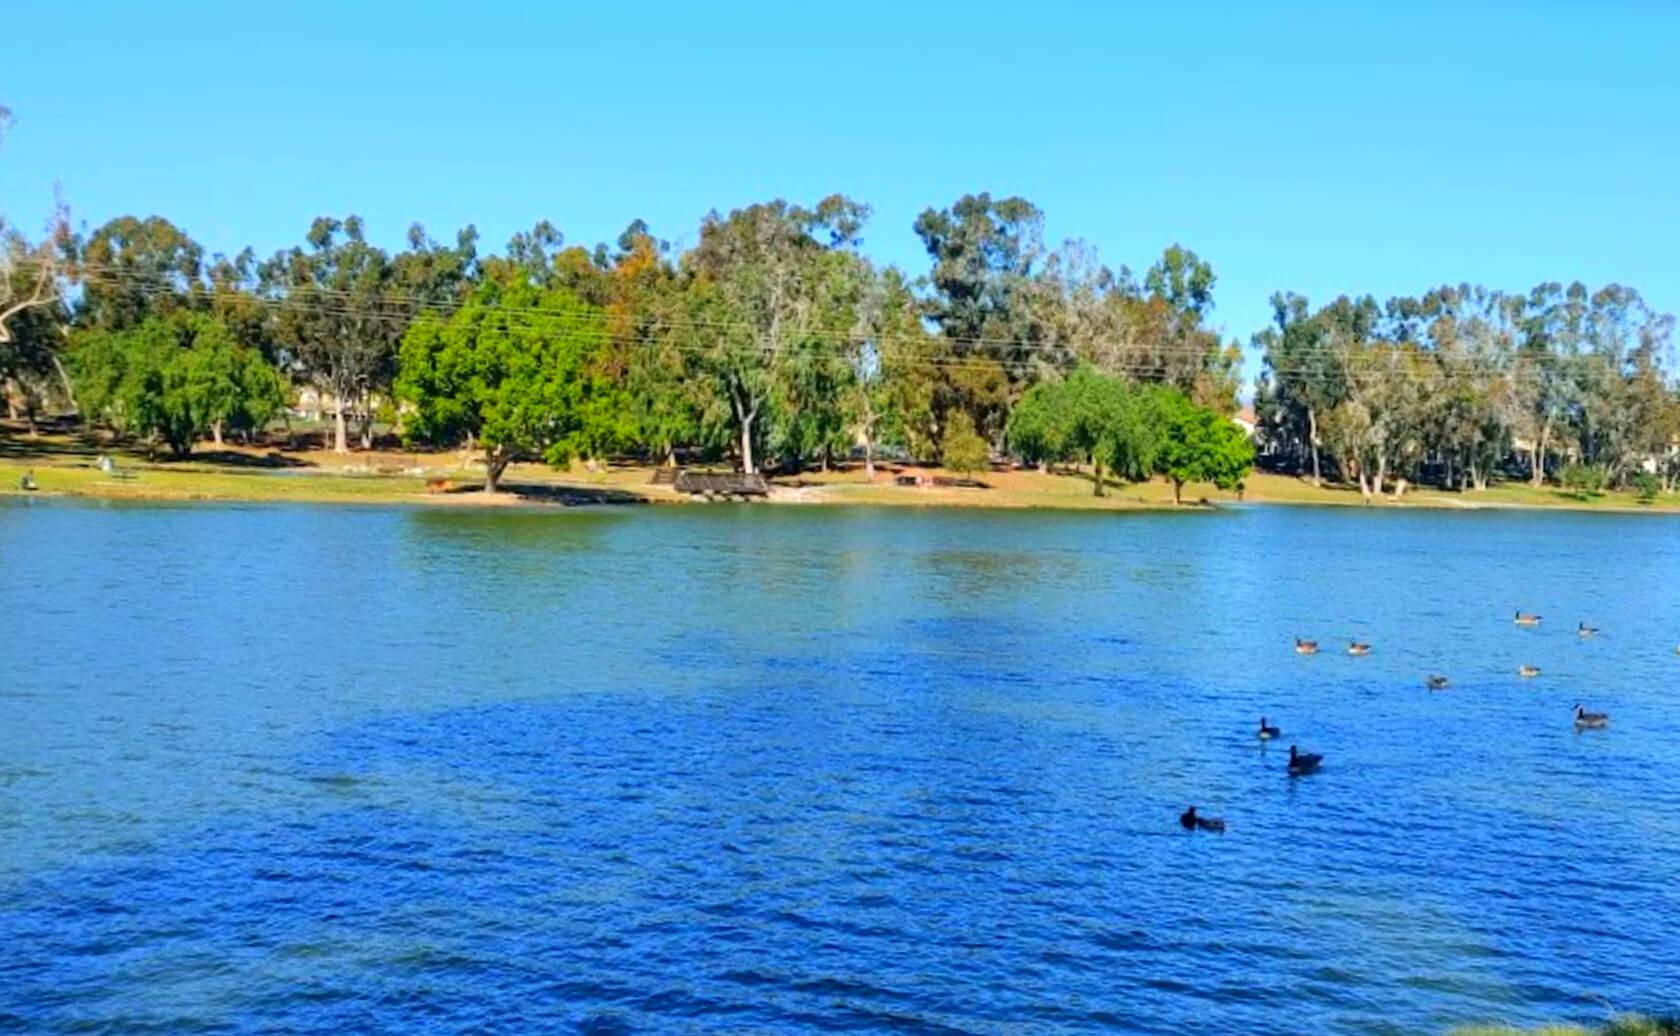 Tri-City-Park-Lake-Fishing-Guide-Report-Placentia-CA-03